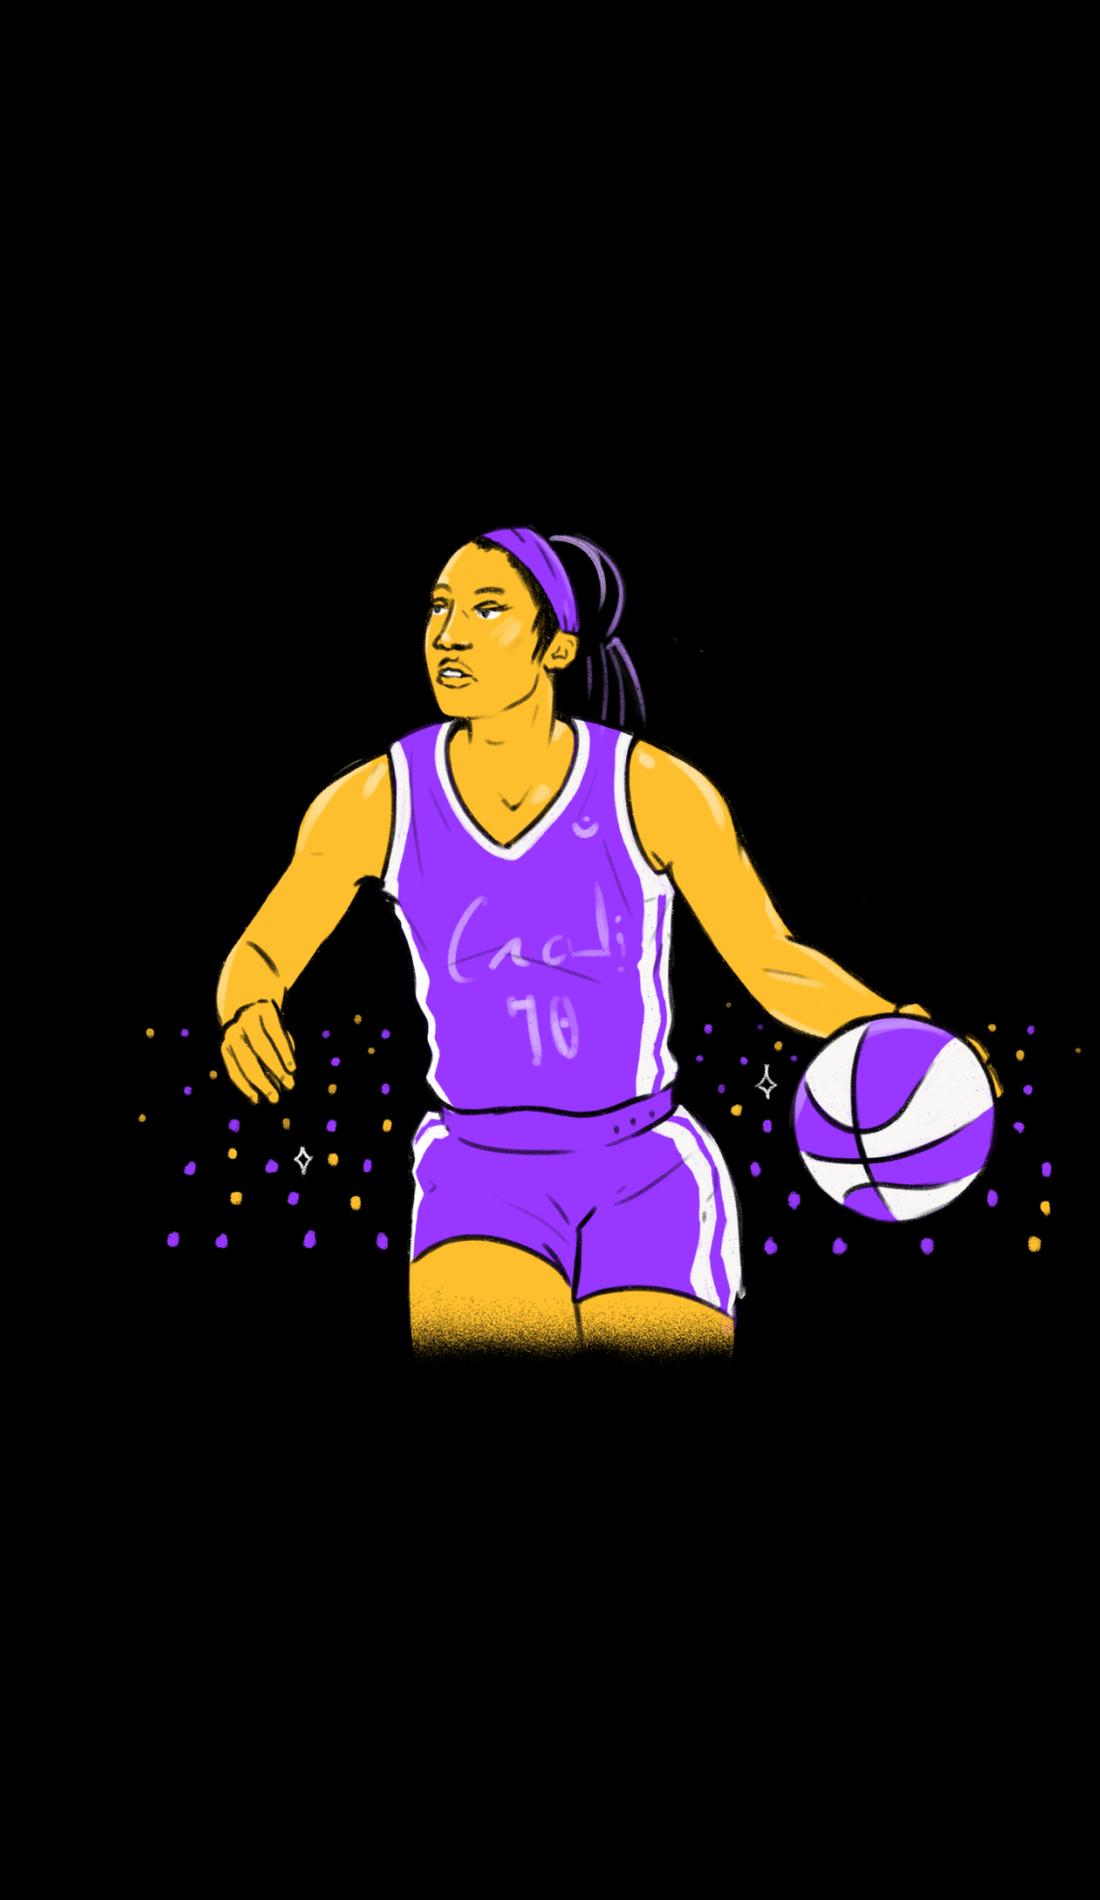 A Wichita State Shockers Womens Basketball live event